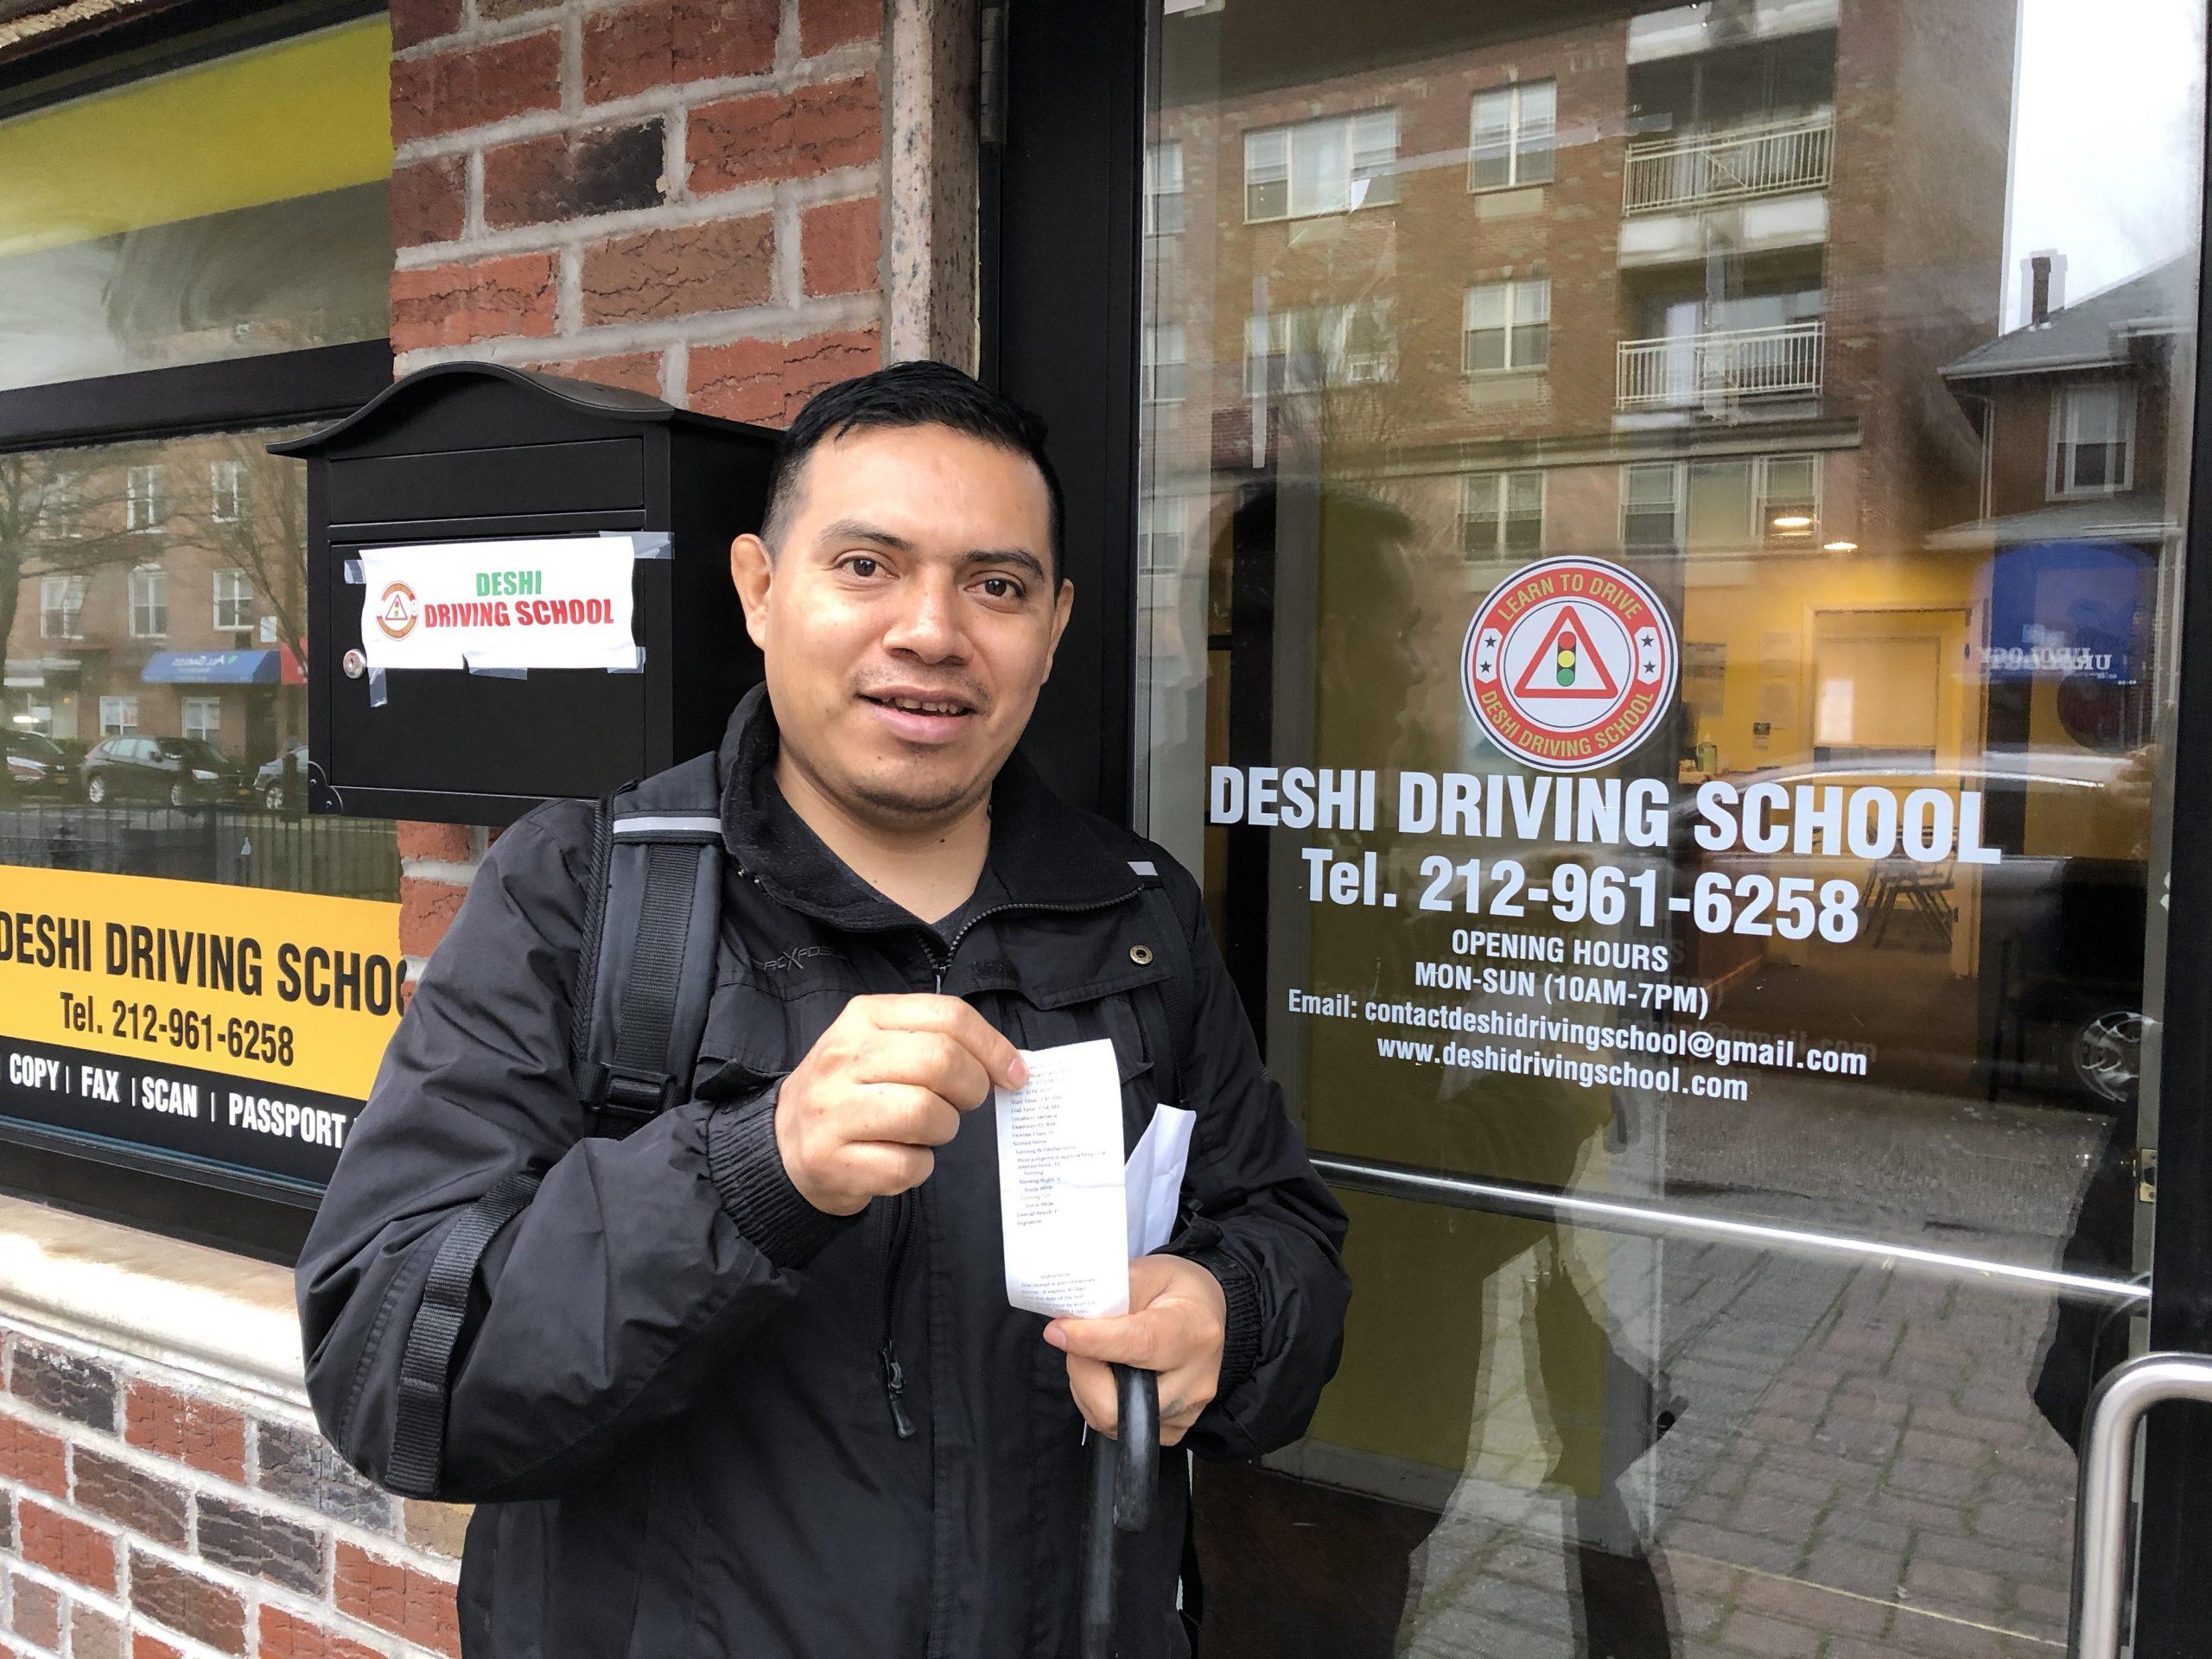 Deshi Driving School